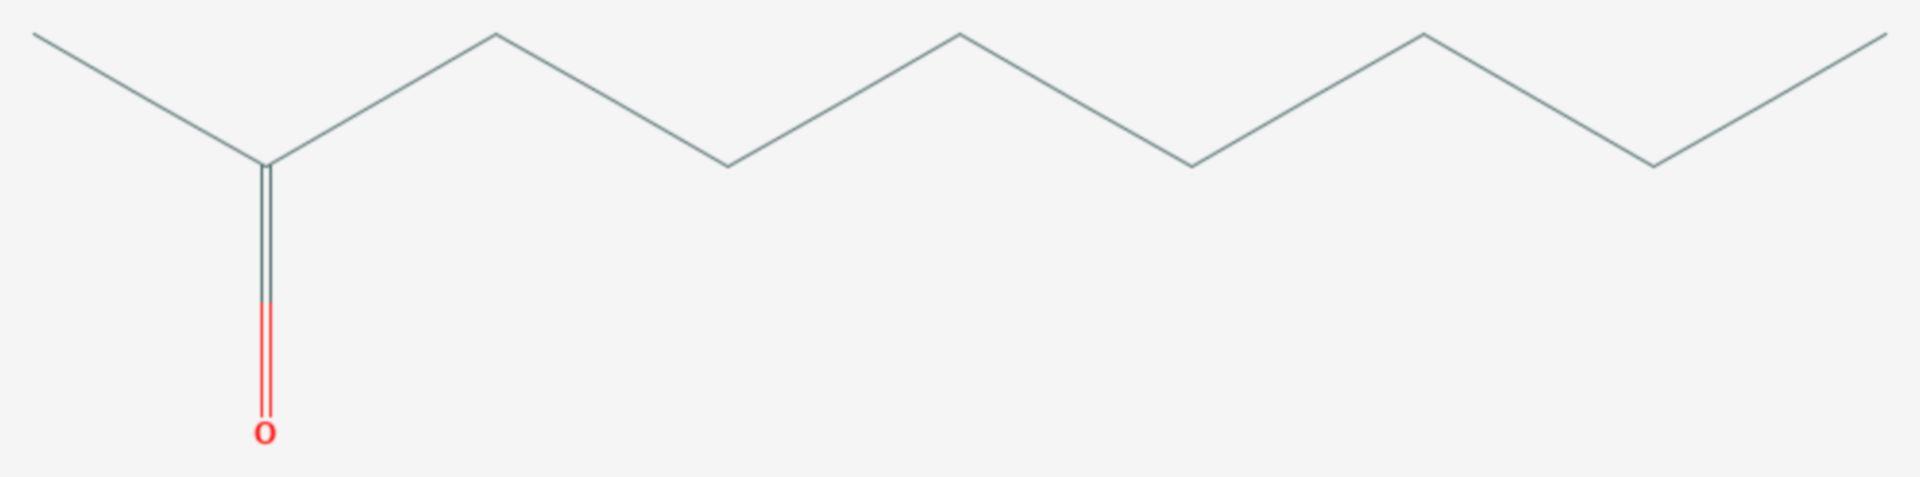 2-Nonanon (Strukturformel)